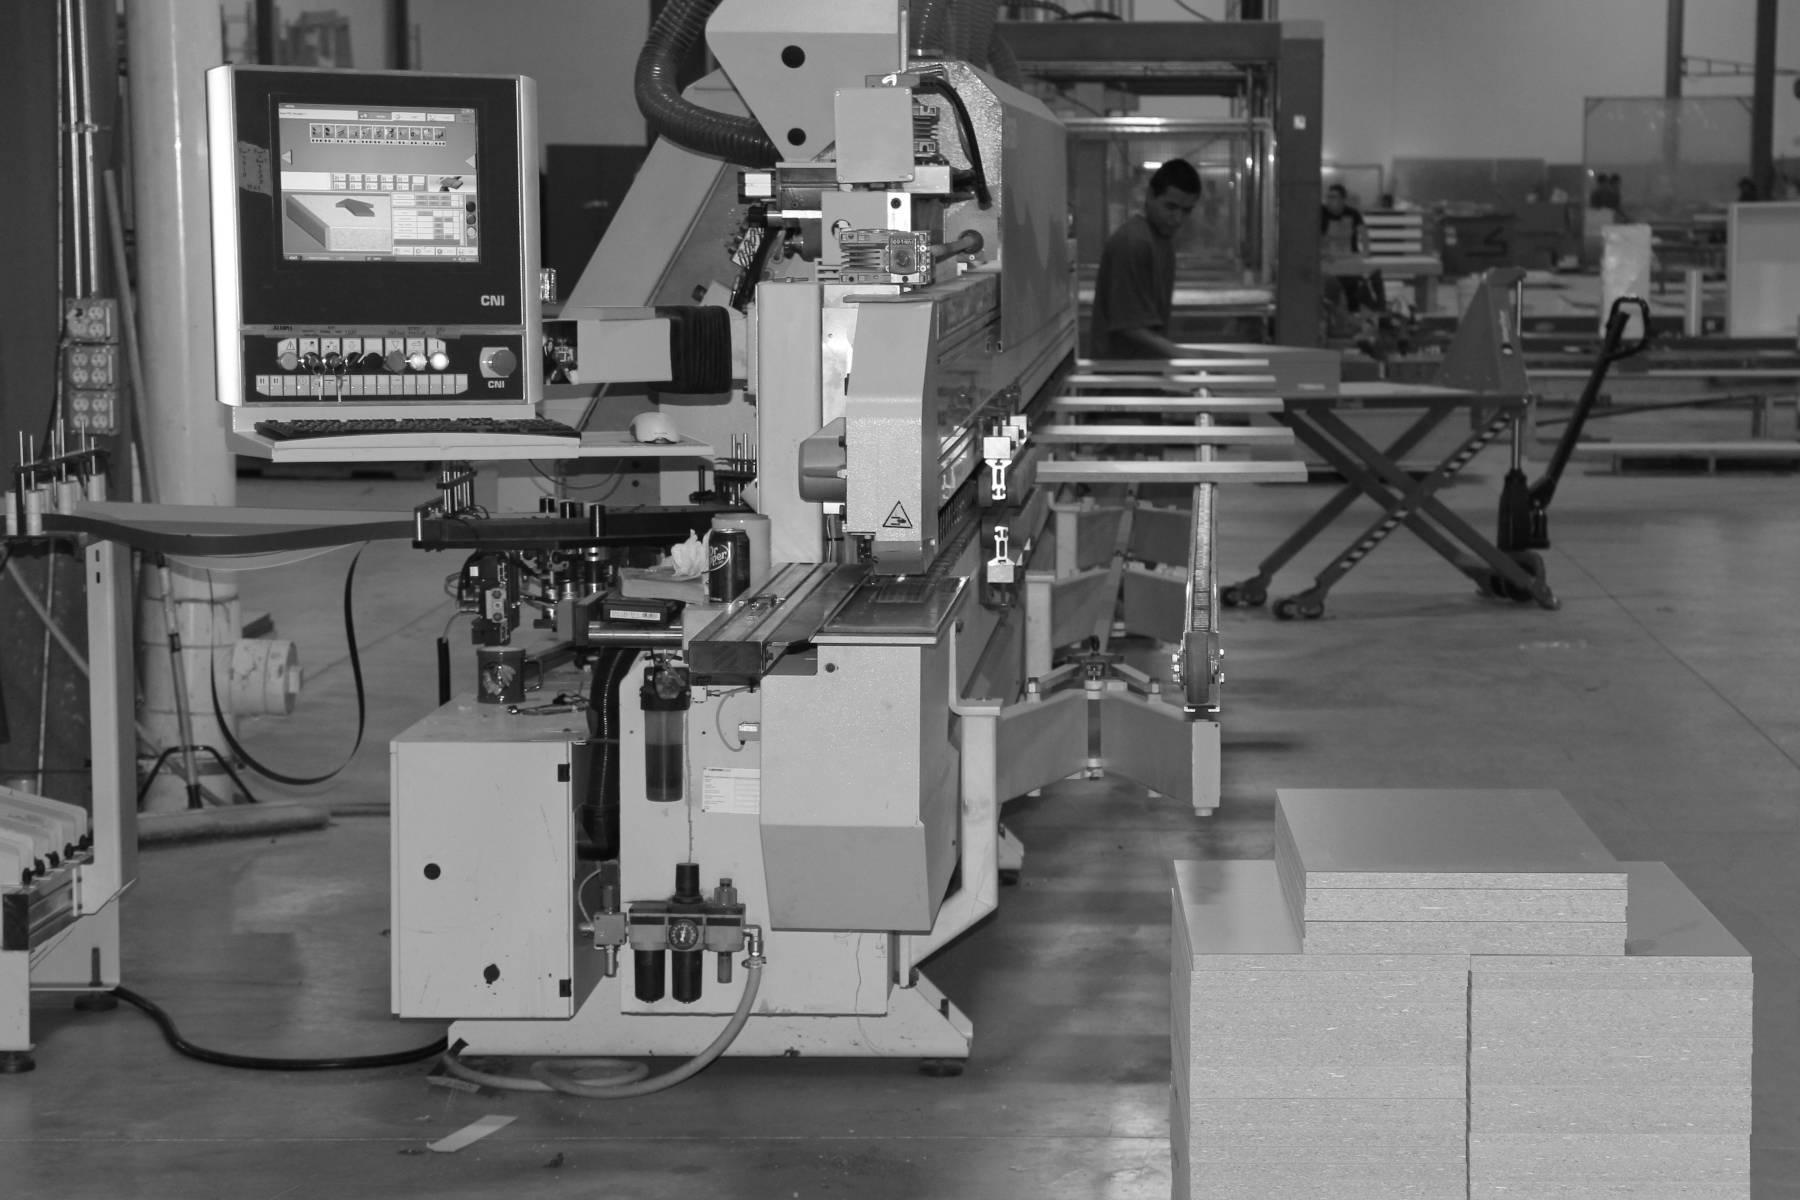 https://mw-sf.com/wp-content/uploads/2019/11/wood-manufacturing-06.jpg